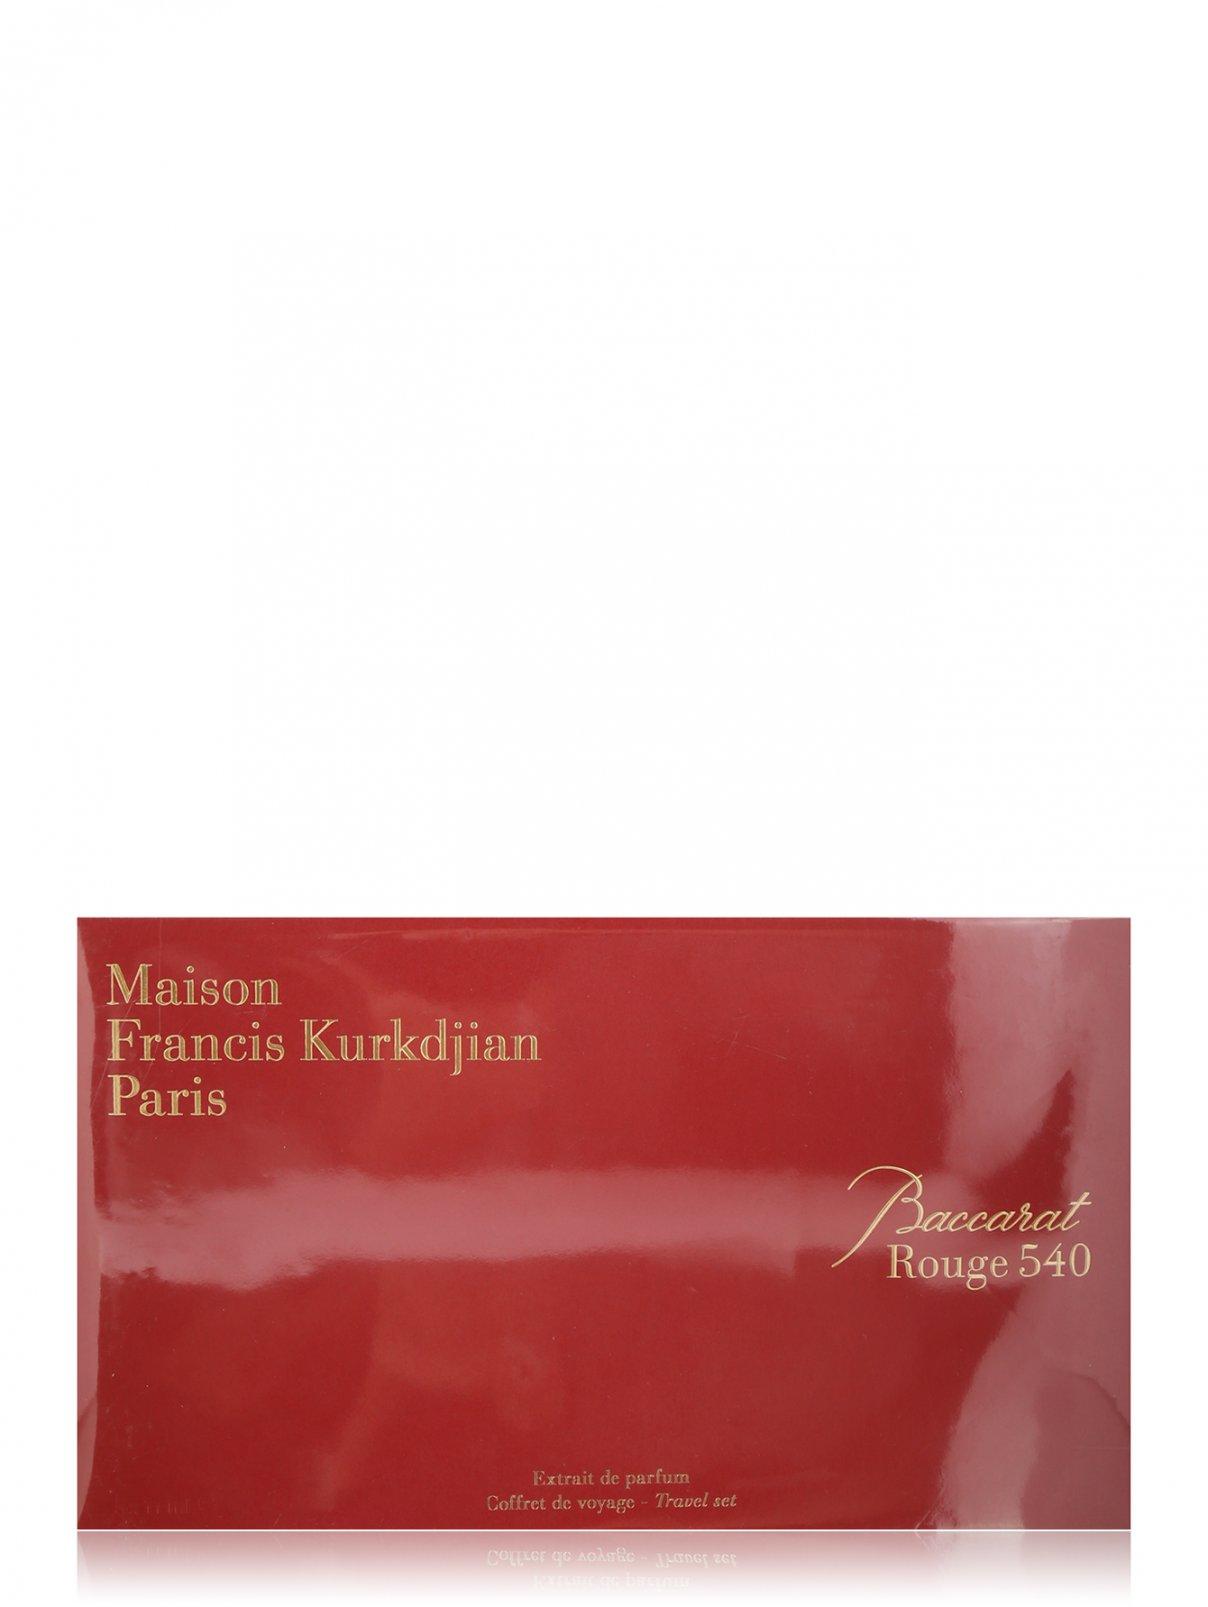 Набор рефилов с атомайзером 5*11 мл Baccarat Rouge 540 Maison Francis Kurkdjian  –  Общий вид